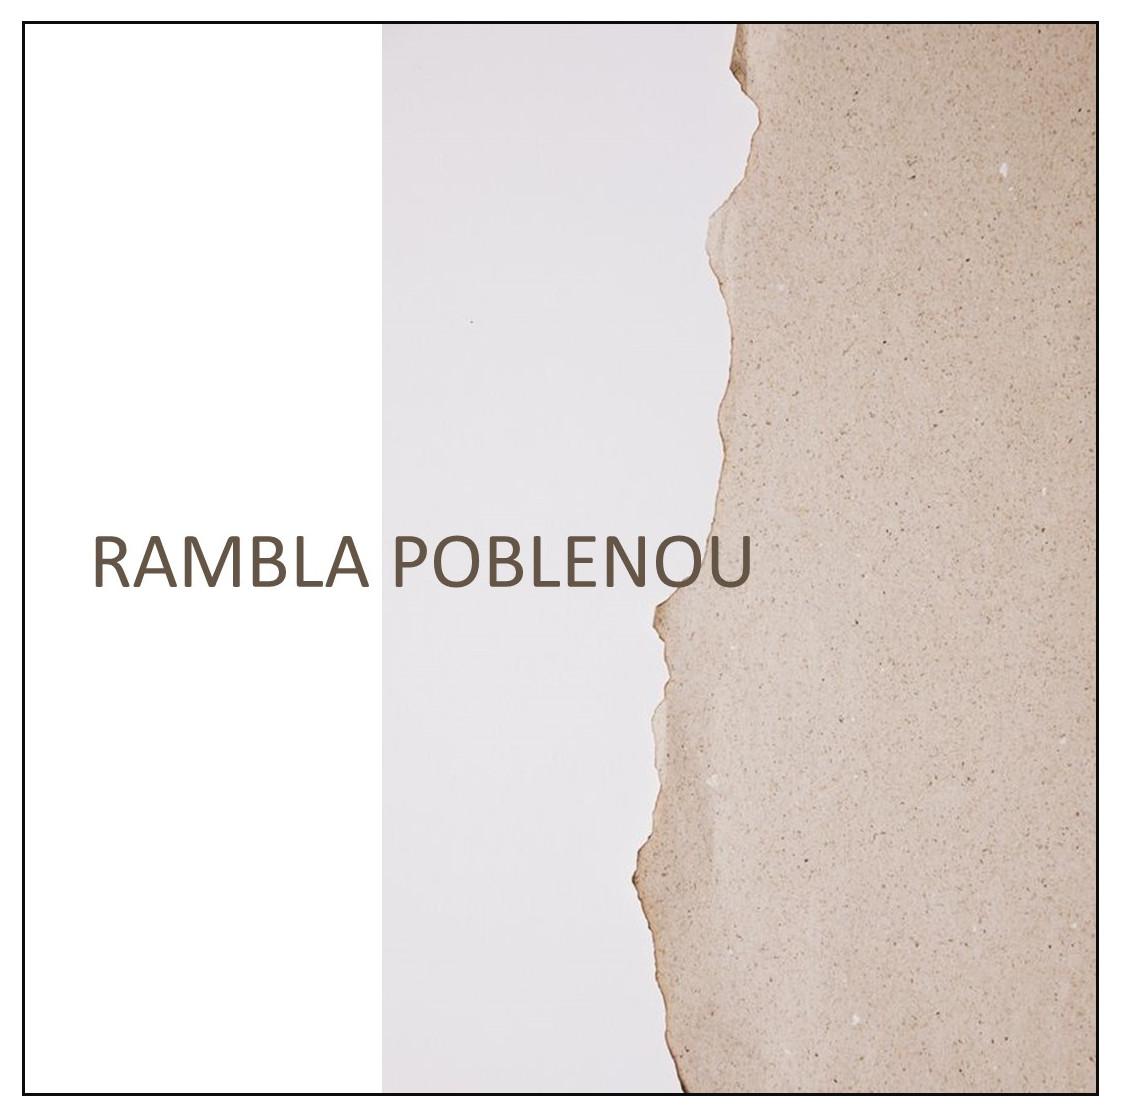 PROYECTO RAMBLA POBLENOU